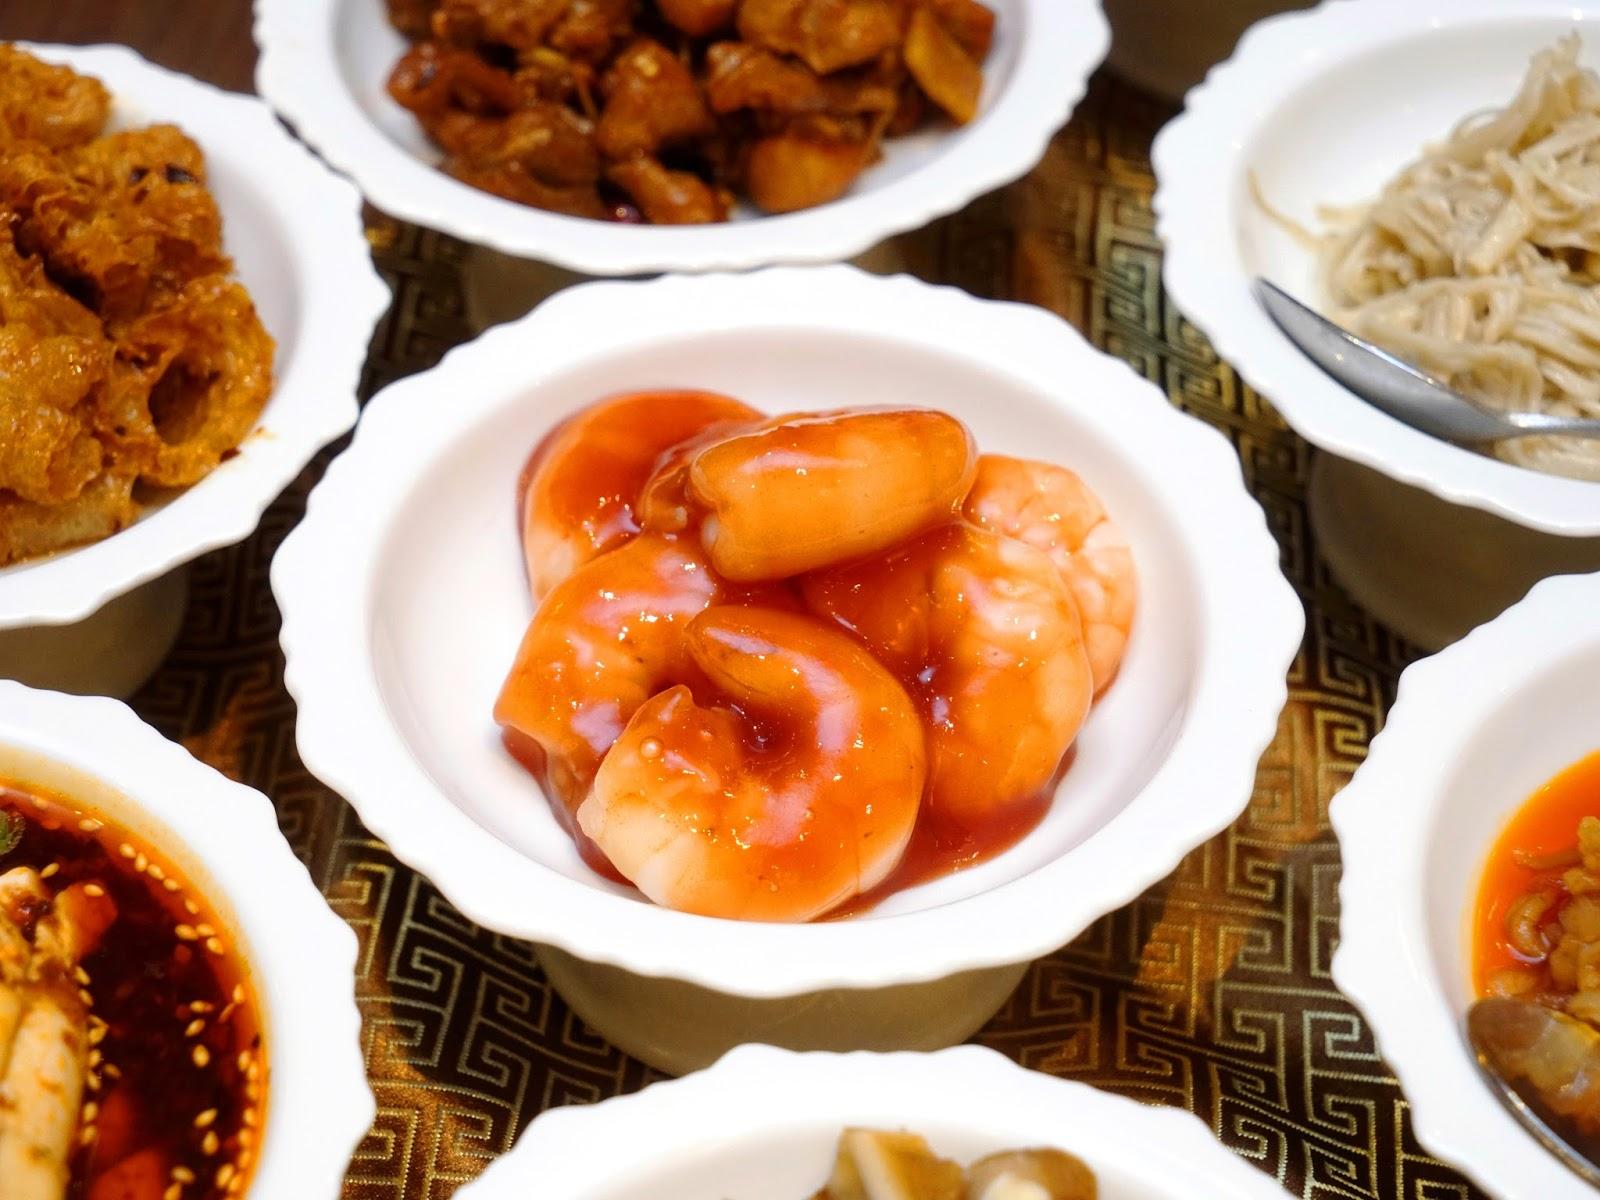 Weddings At Si Chuan Dou Hua At Parkroyal Beach Road: PinkyPiggu: Si Chuan Dou Hua Restaurant 四川豆花饭庄 @ PARKROYAL